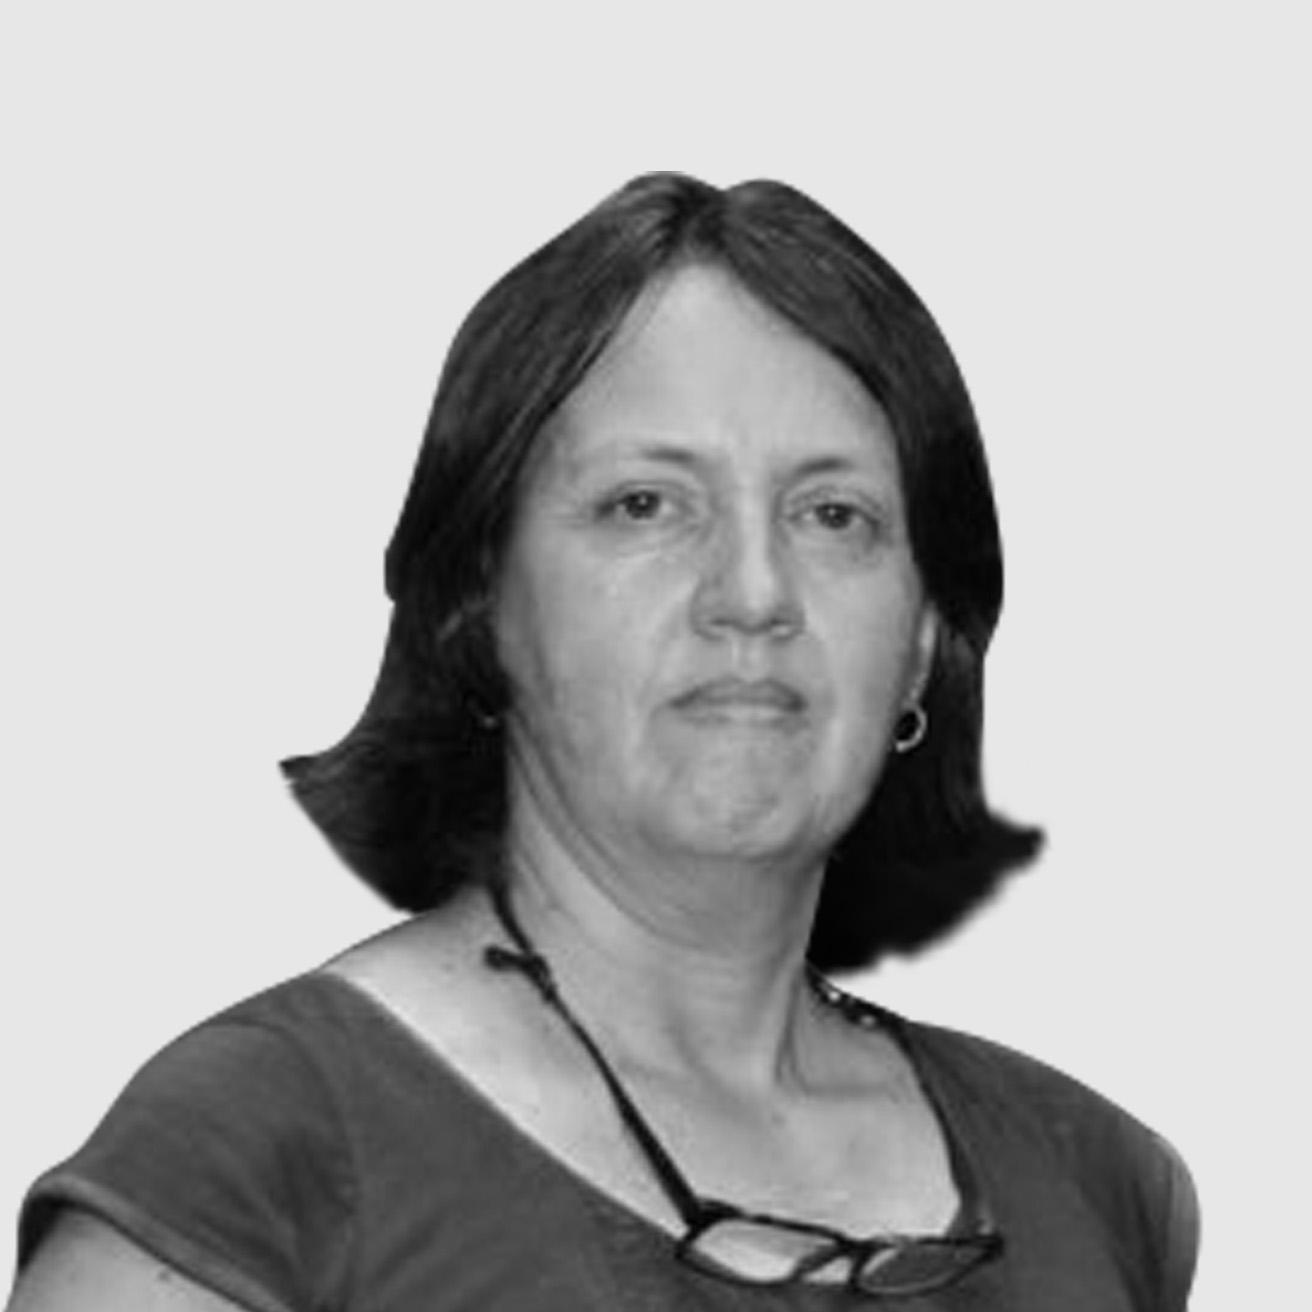 Ana Luisa Arocena